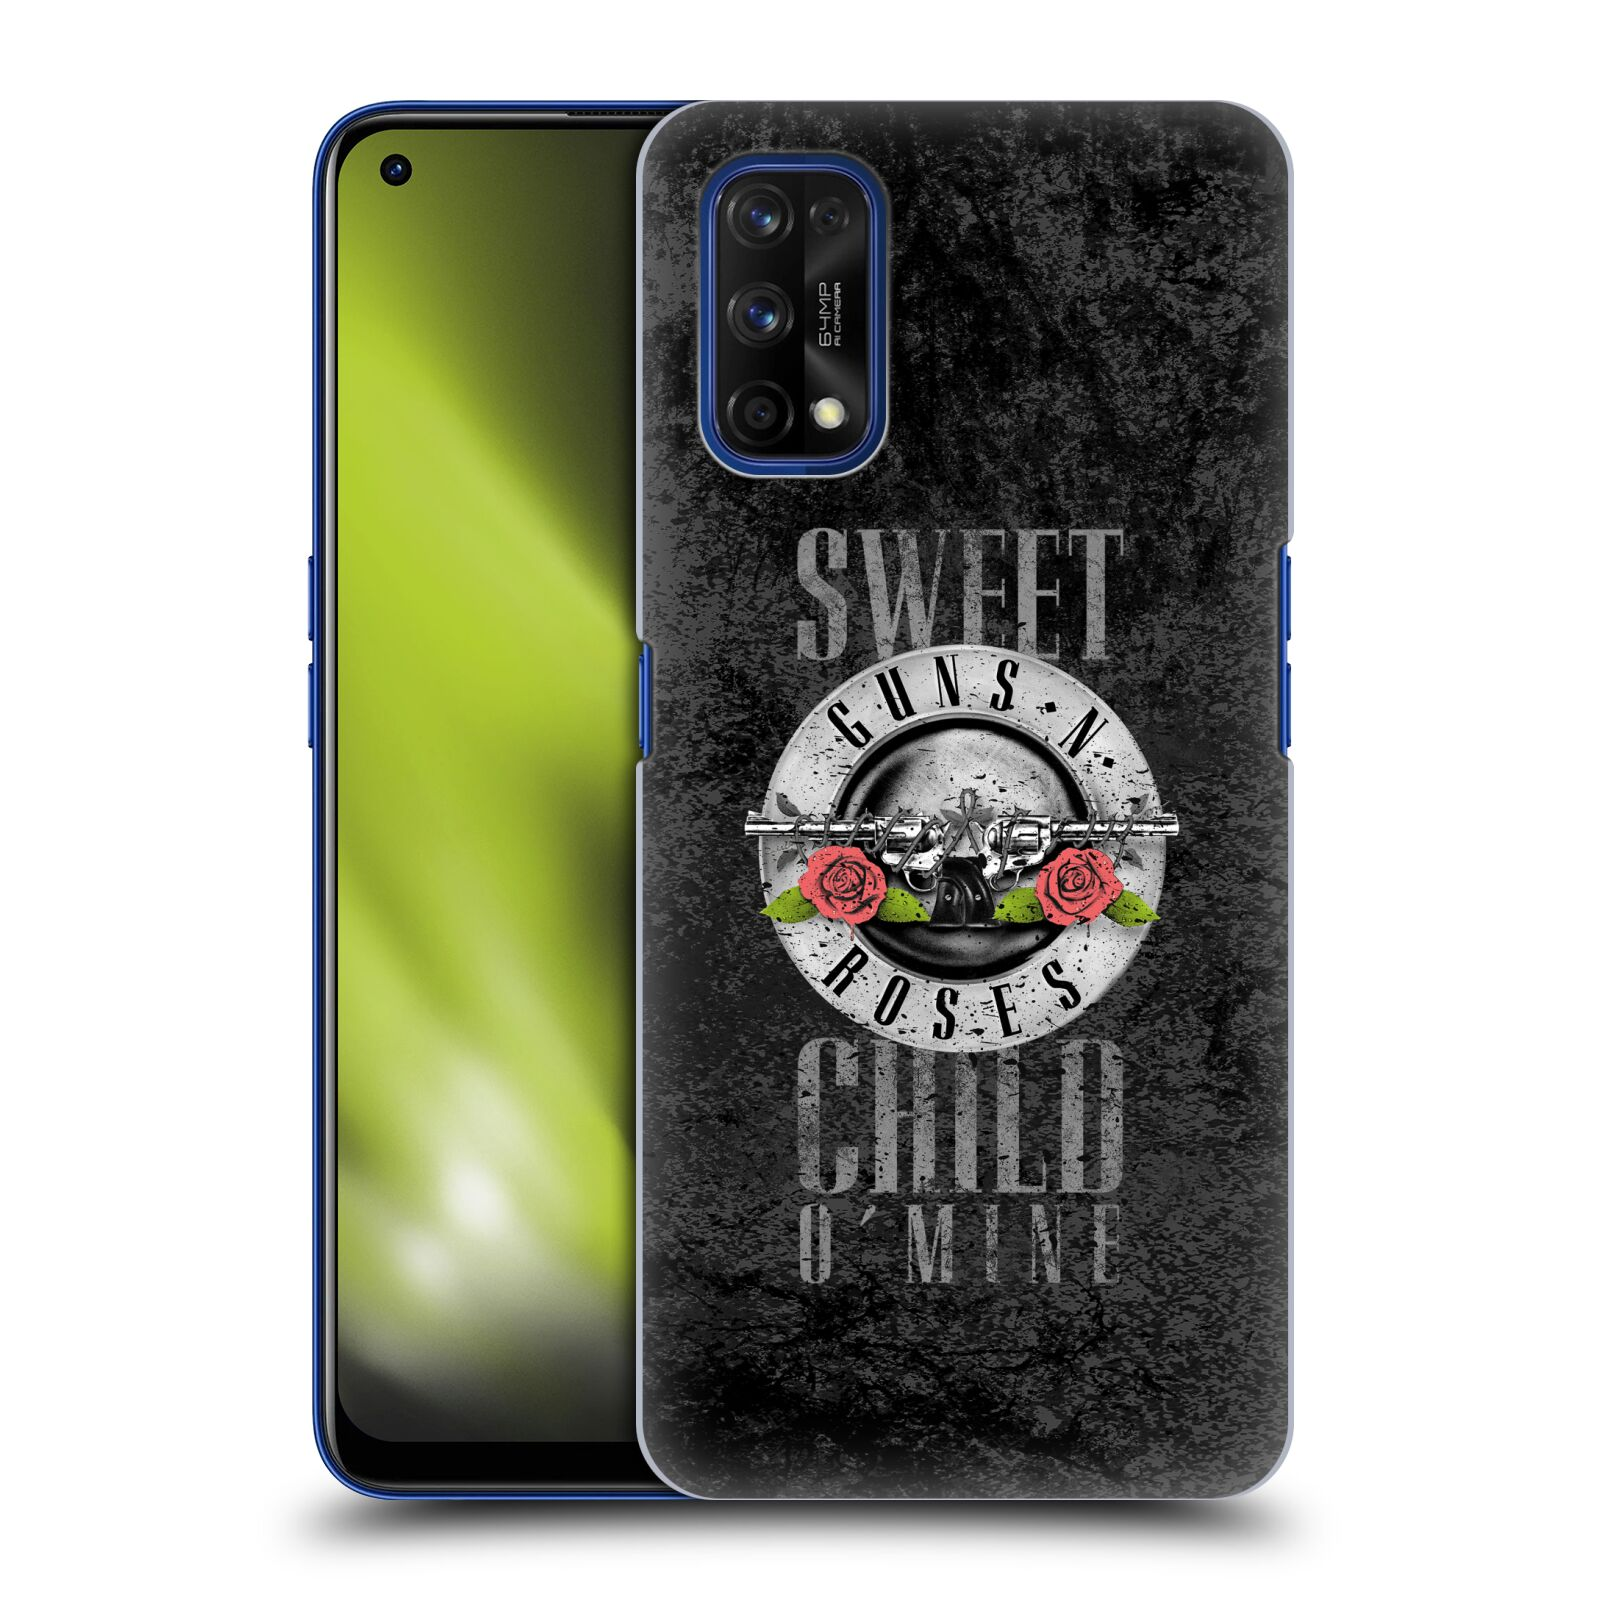 Plastové pouzdro na mobil Realme 7 Pro - Head Case - Guns N' Roses - Sweet Child